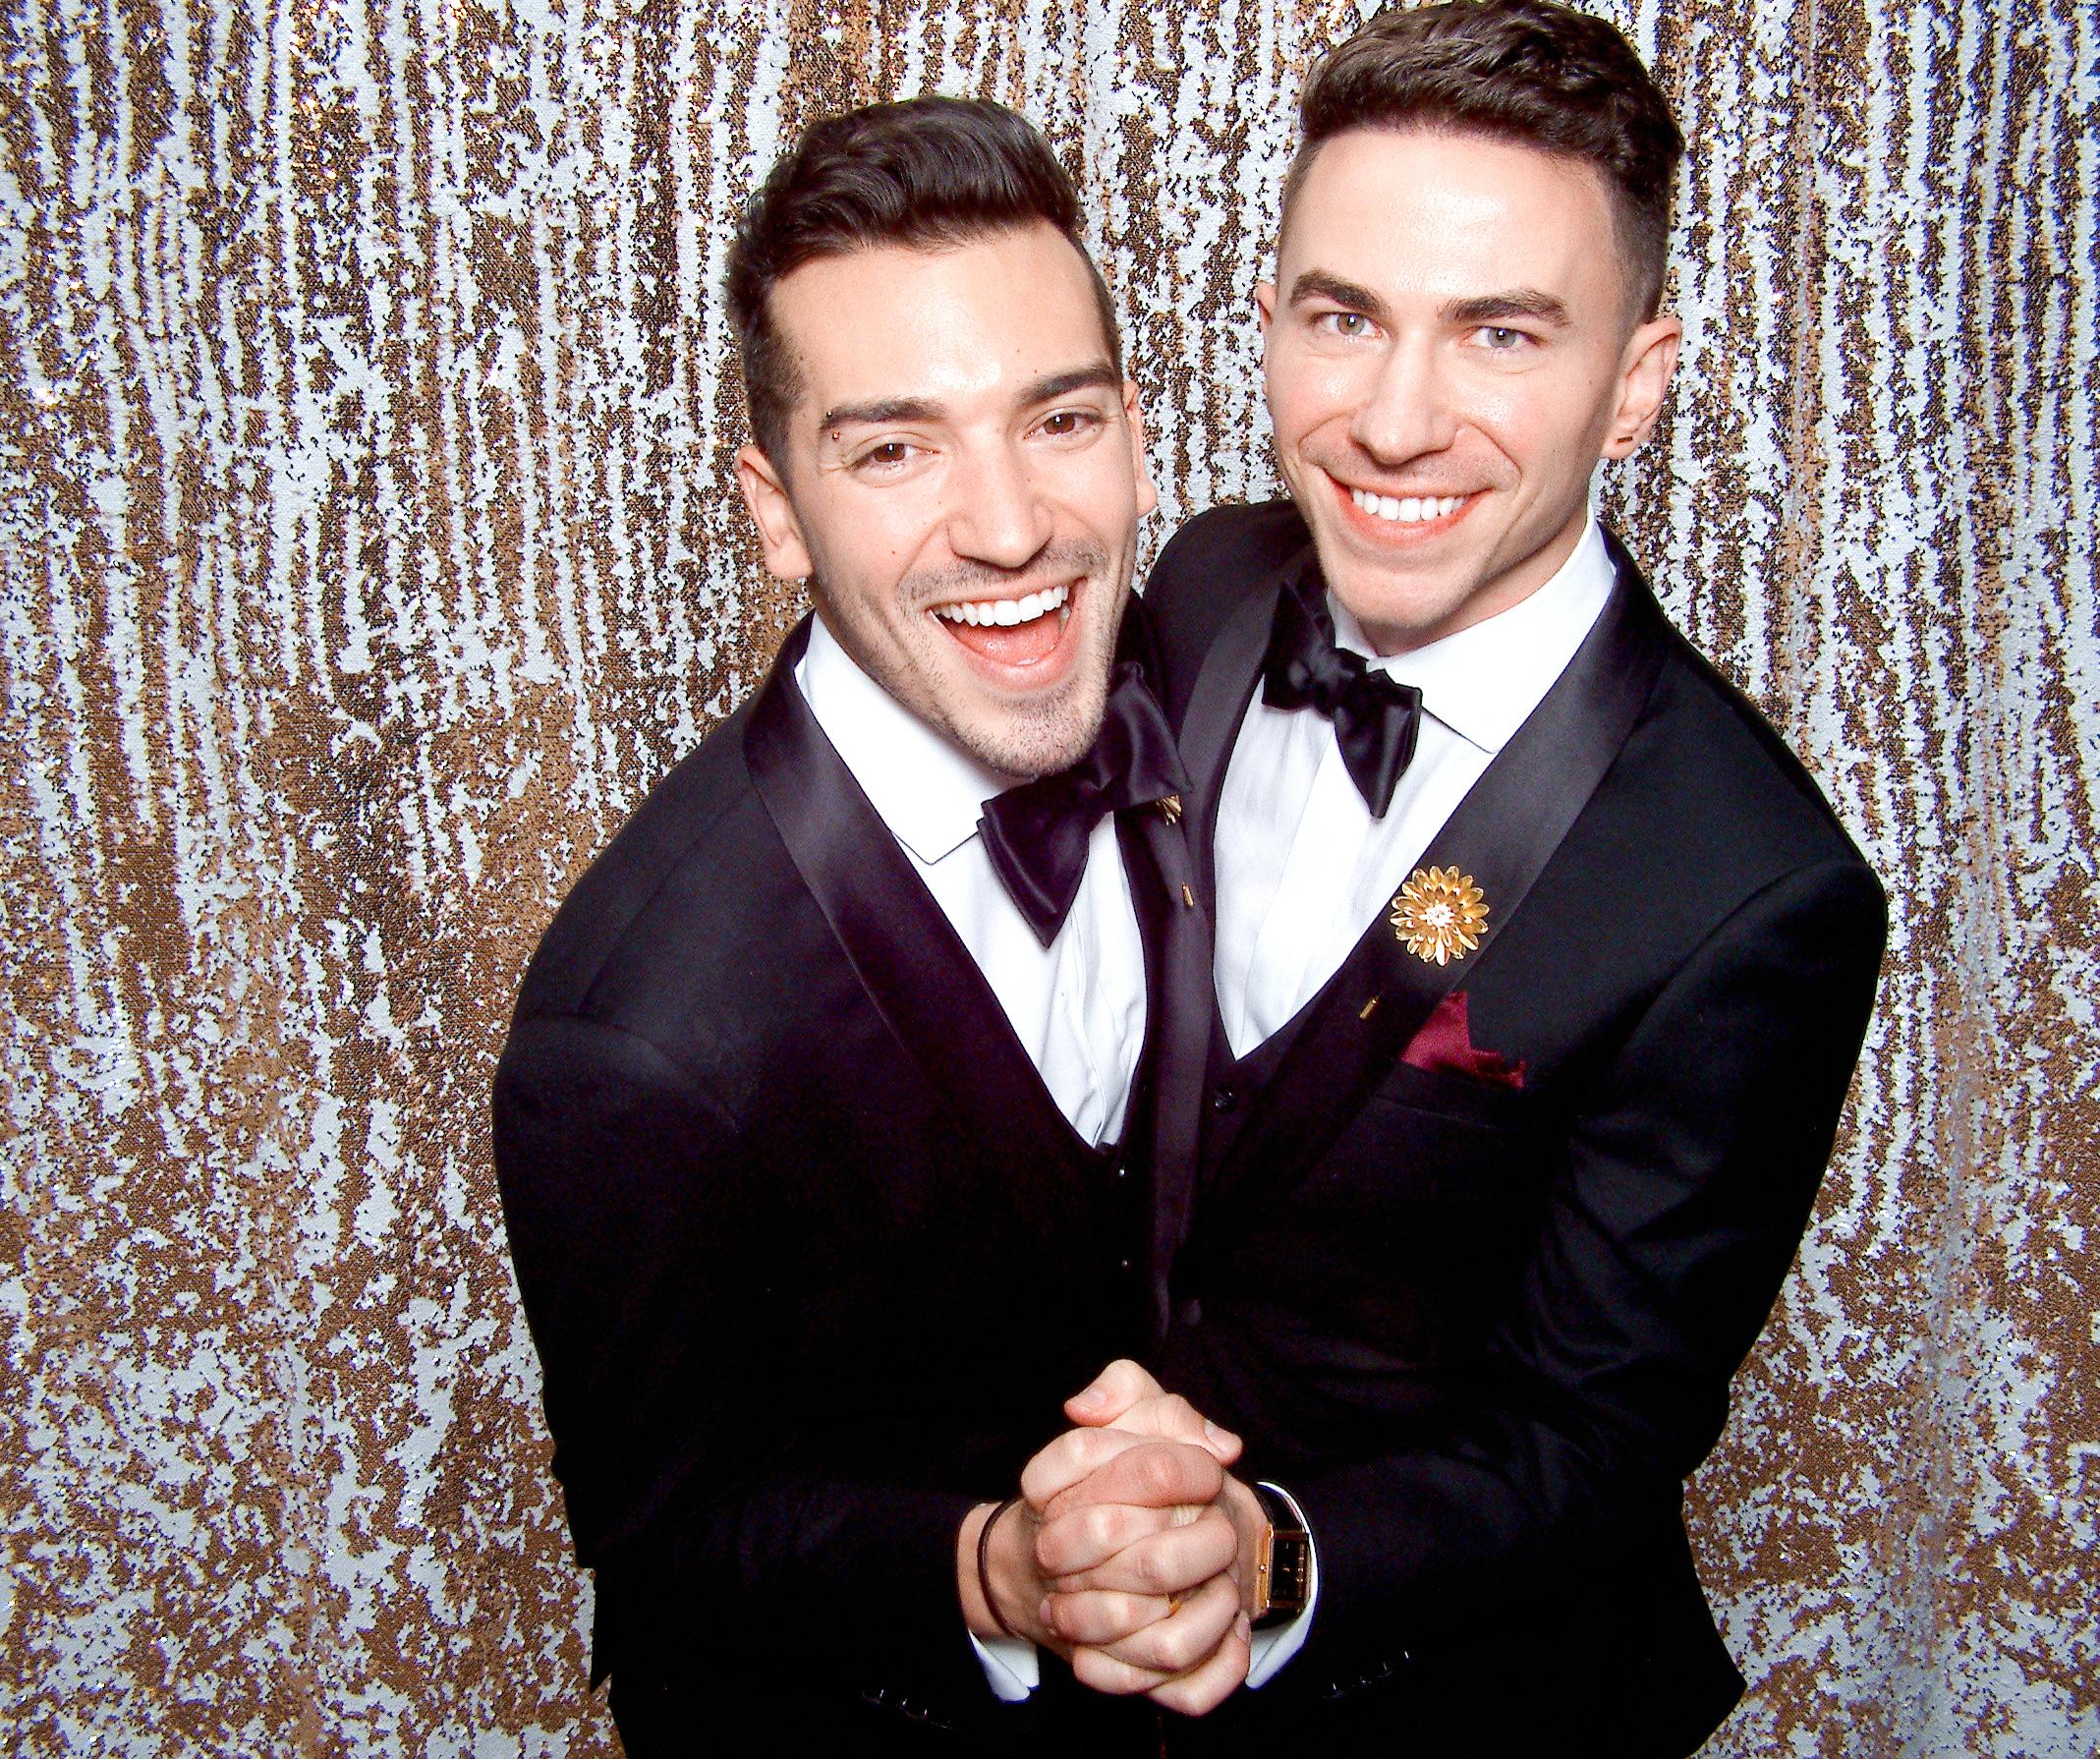 Fonthill Castle Wedding |Justin & Andrew